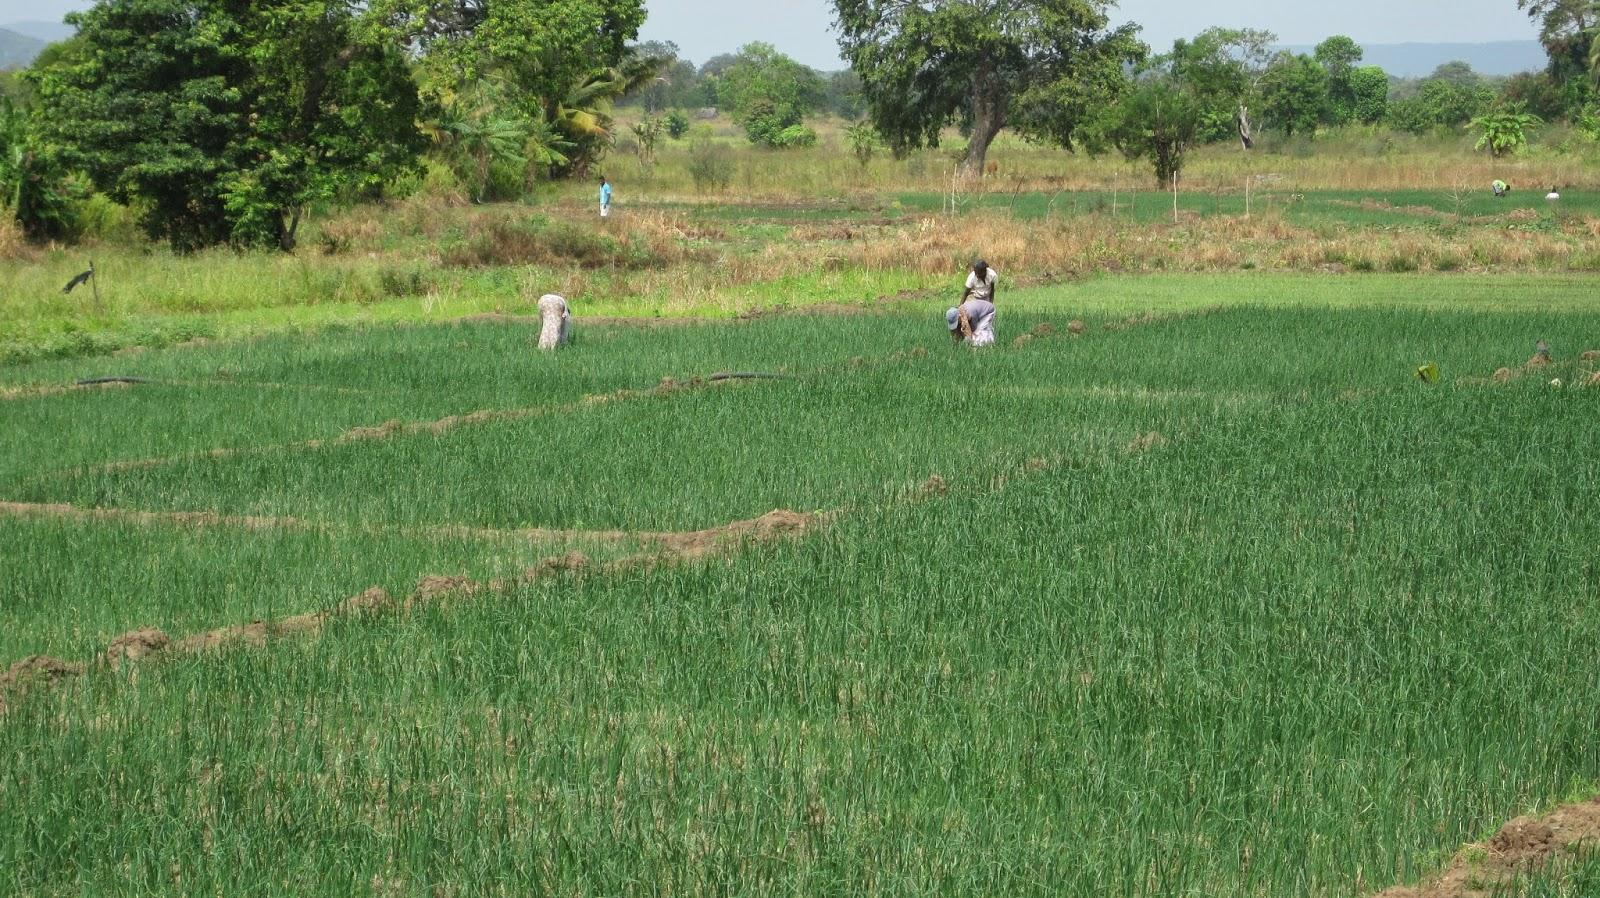 Campos de arroz (Sri Lanka)